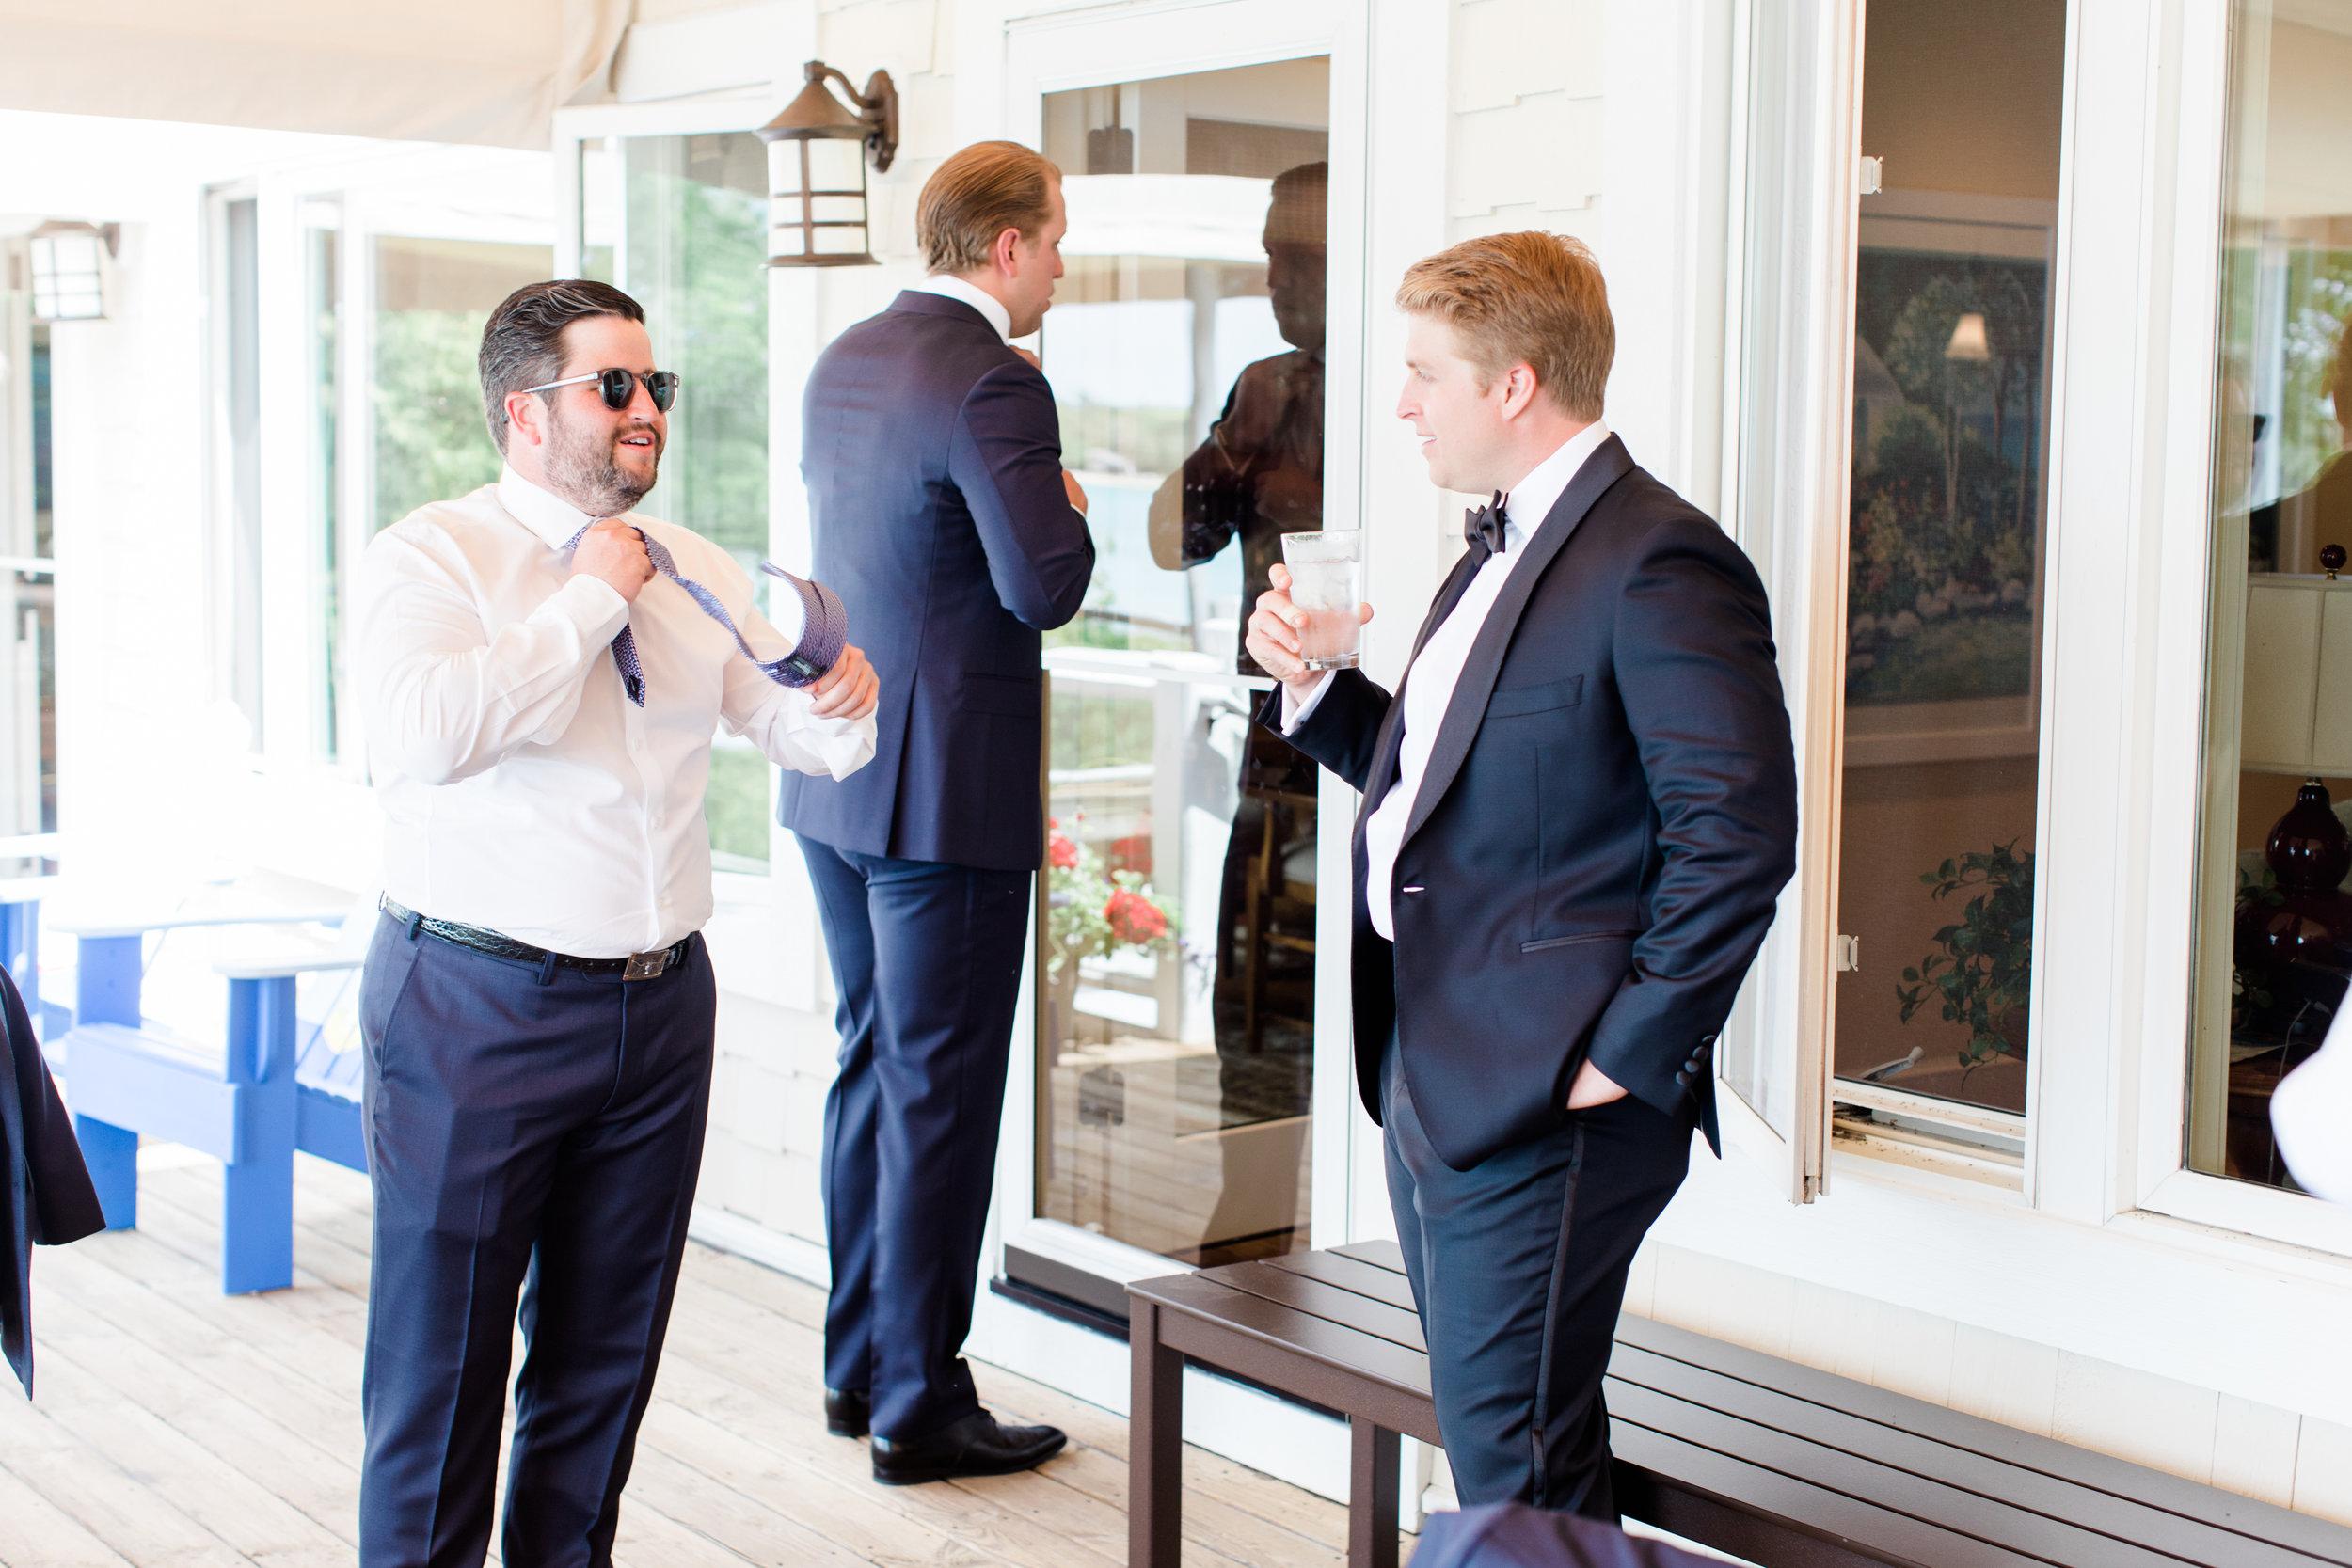 Coffman+Wedding+Getting+Ready+Guys-37.jpg